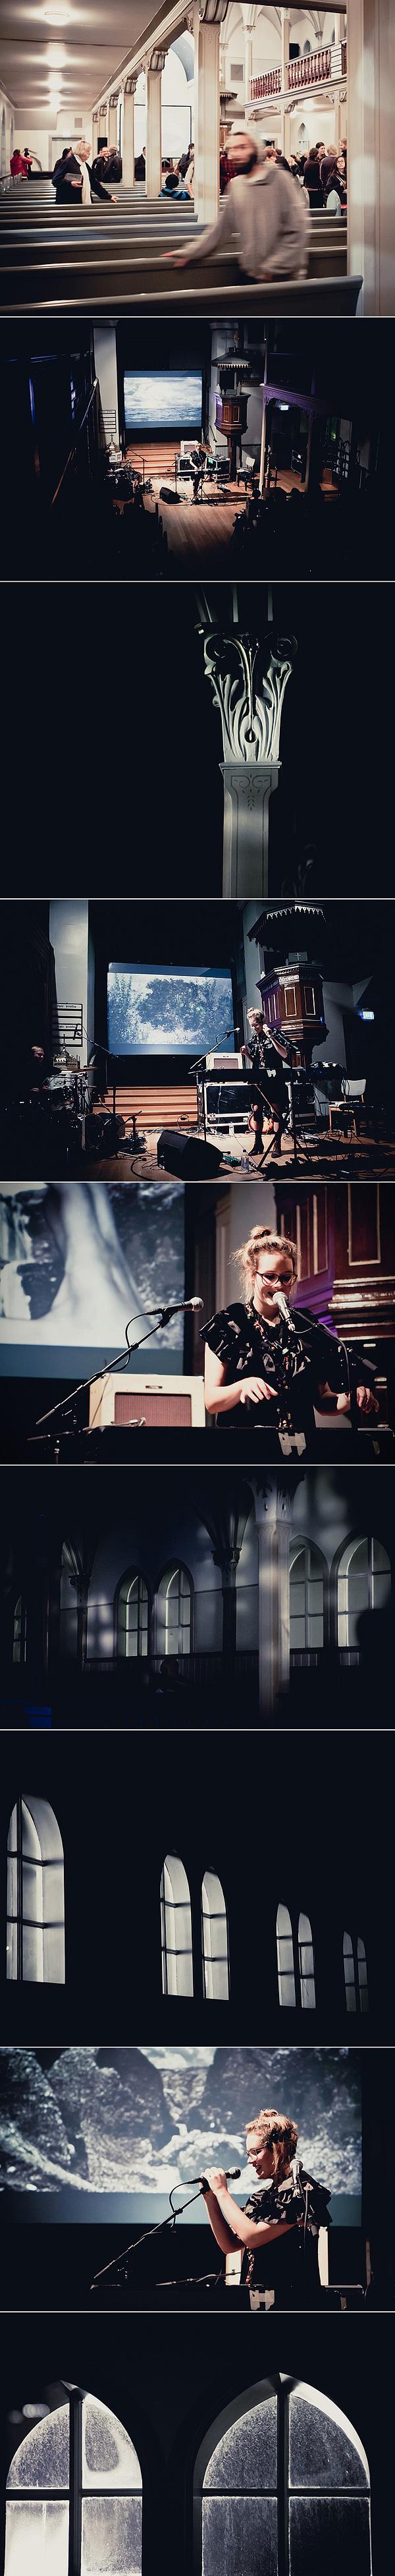 RIFF 2011 - Ciné-concert w/ Skúli Sverrisson & Sóley